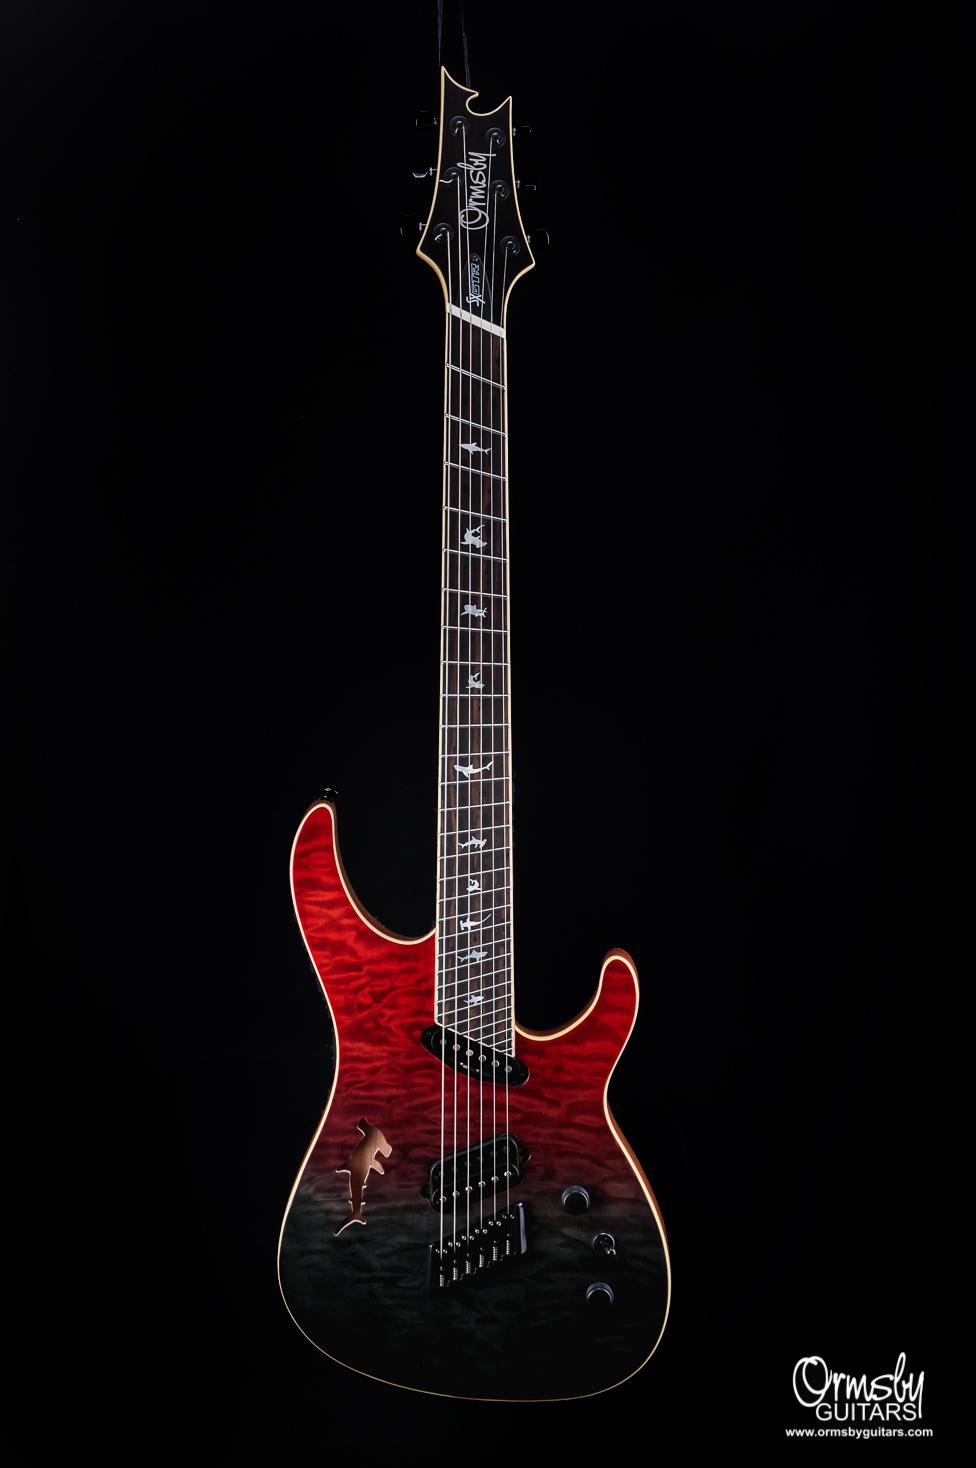 Ormsby Guitars Run 7 SX Shark